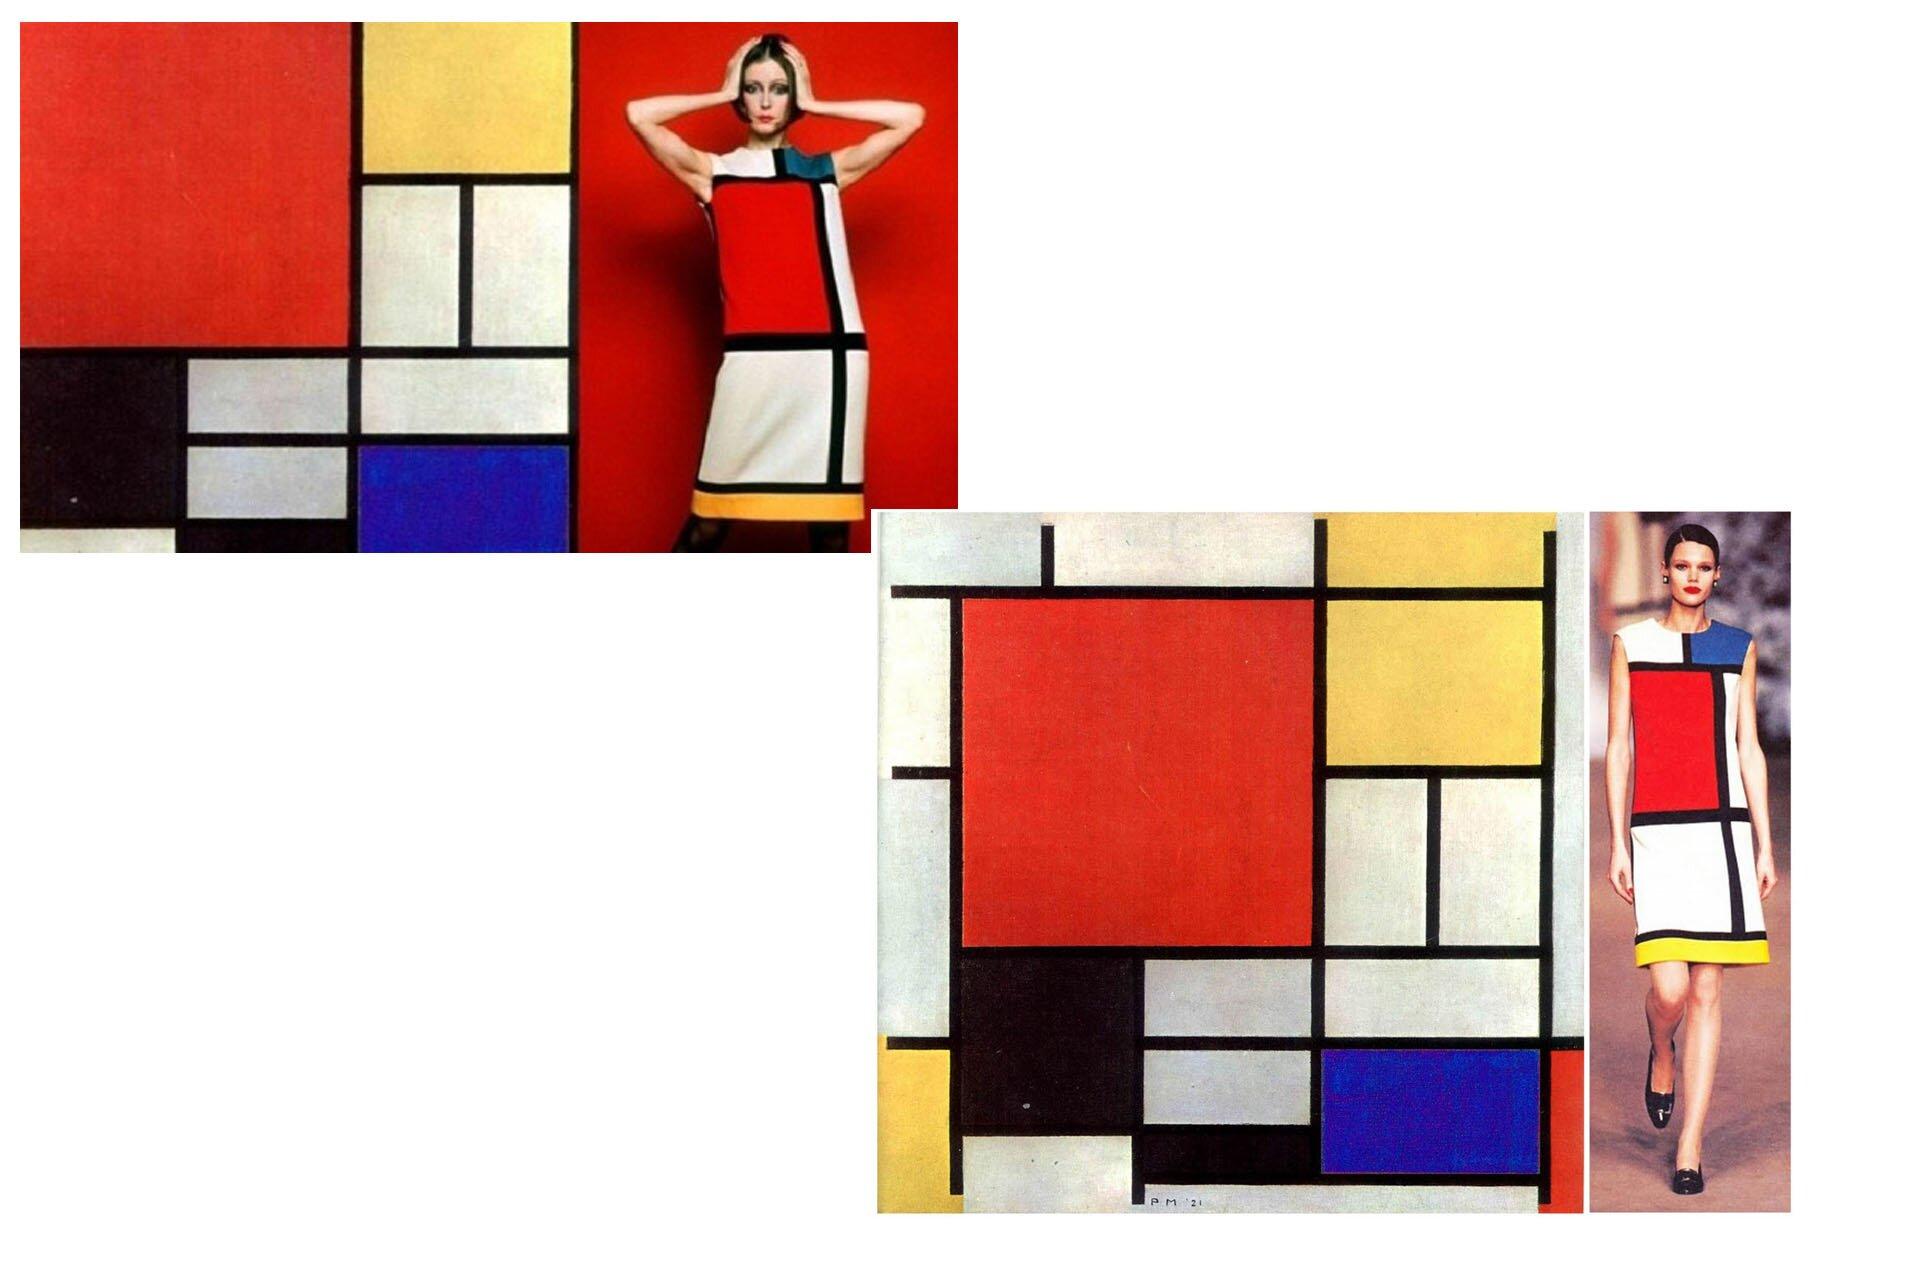 Yves Saint Laurent, Najsłynniejsi projektanci, Francuska moda, Haute Couture, Mondrian